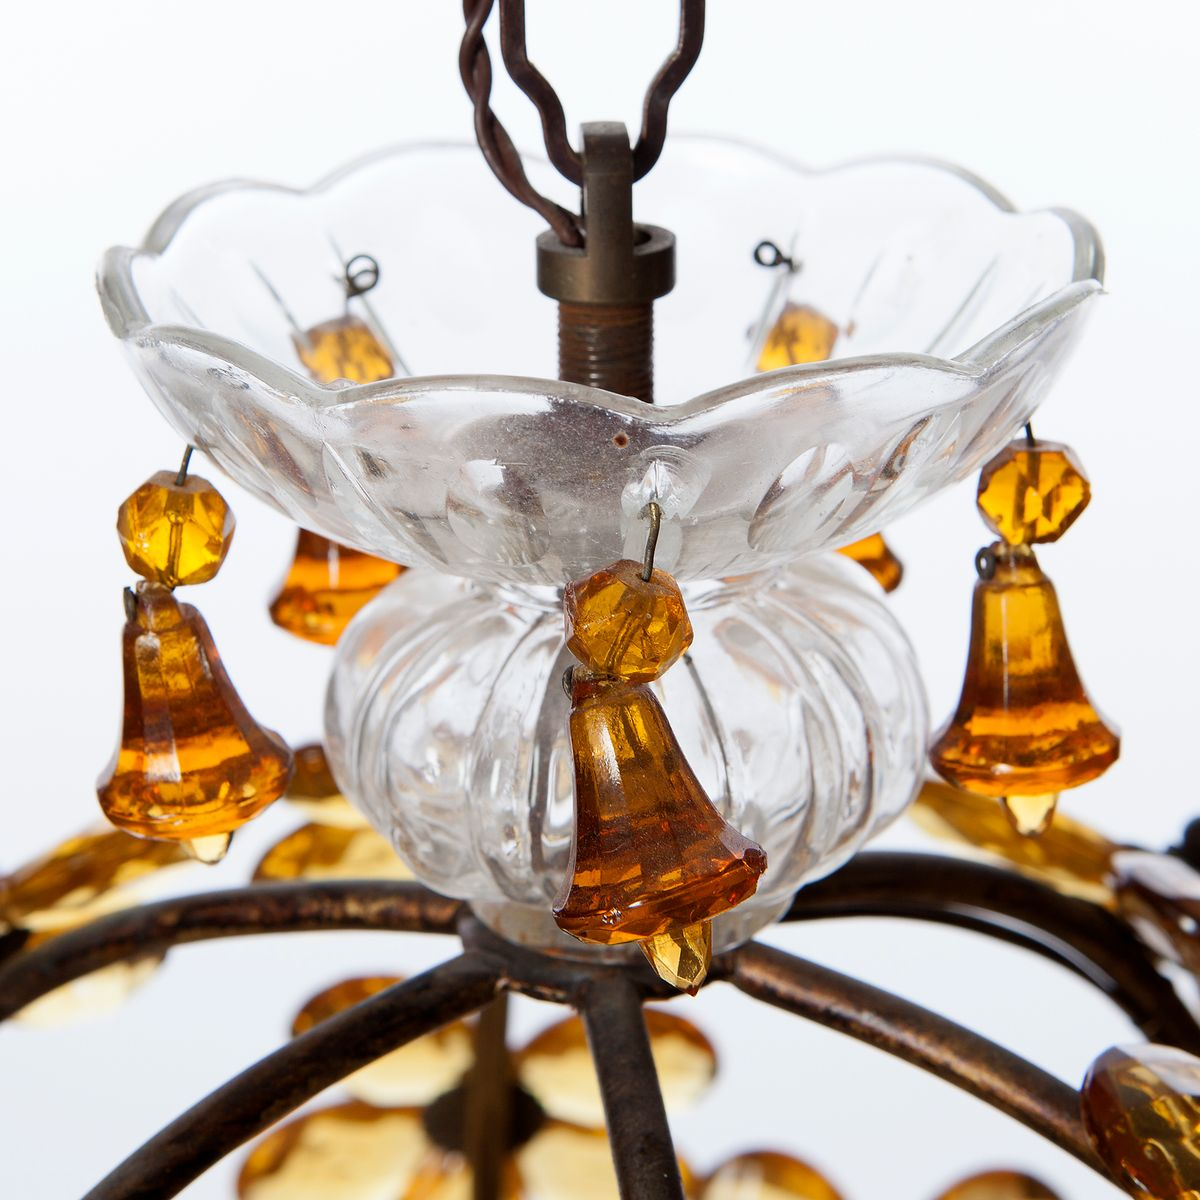 bernsteinfarbene vintage h ngelampe aus kristallglas messing bei pamono kaufen. Black Bedroom Furniture Sets. Home Design Ideas